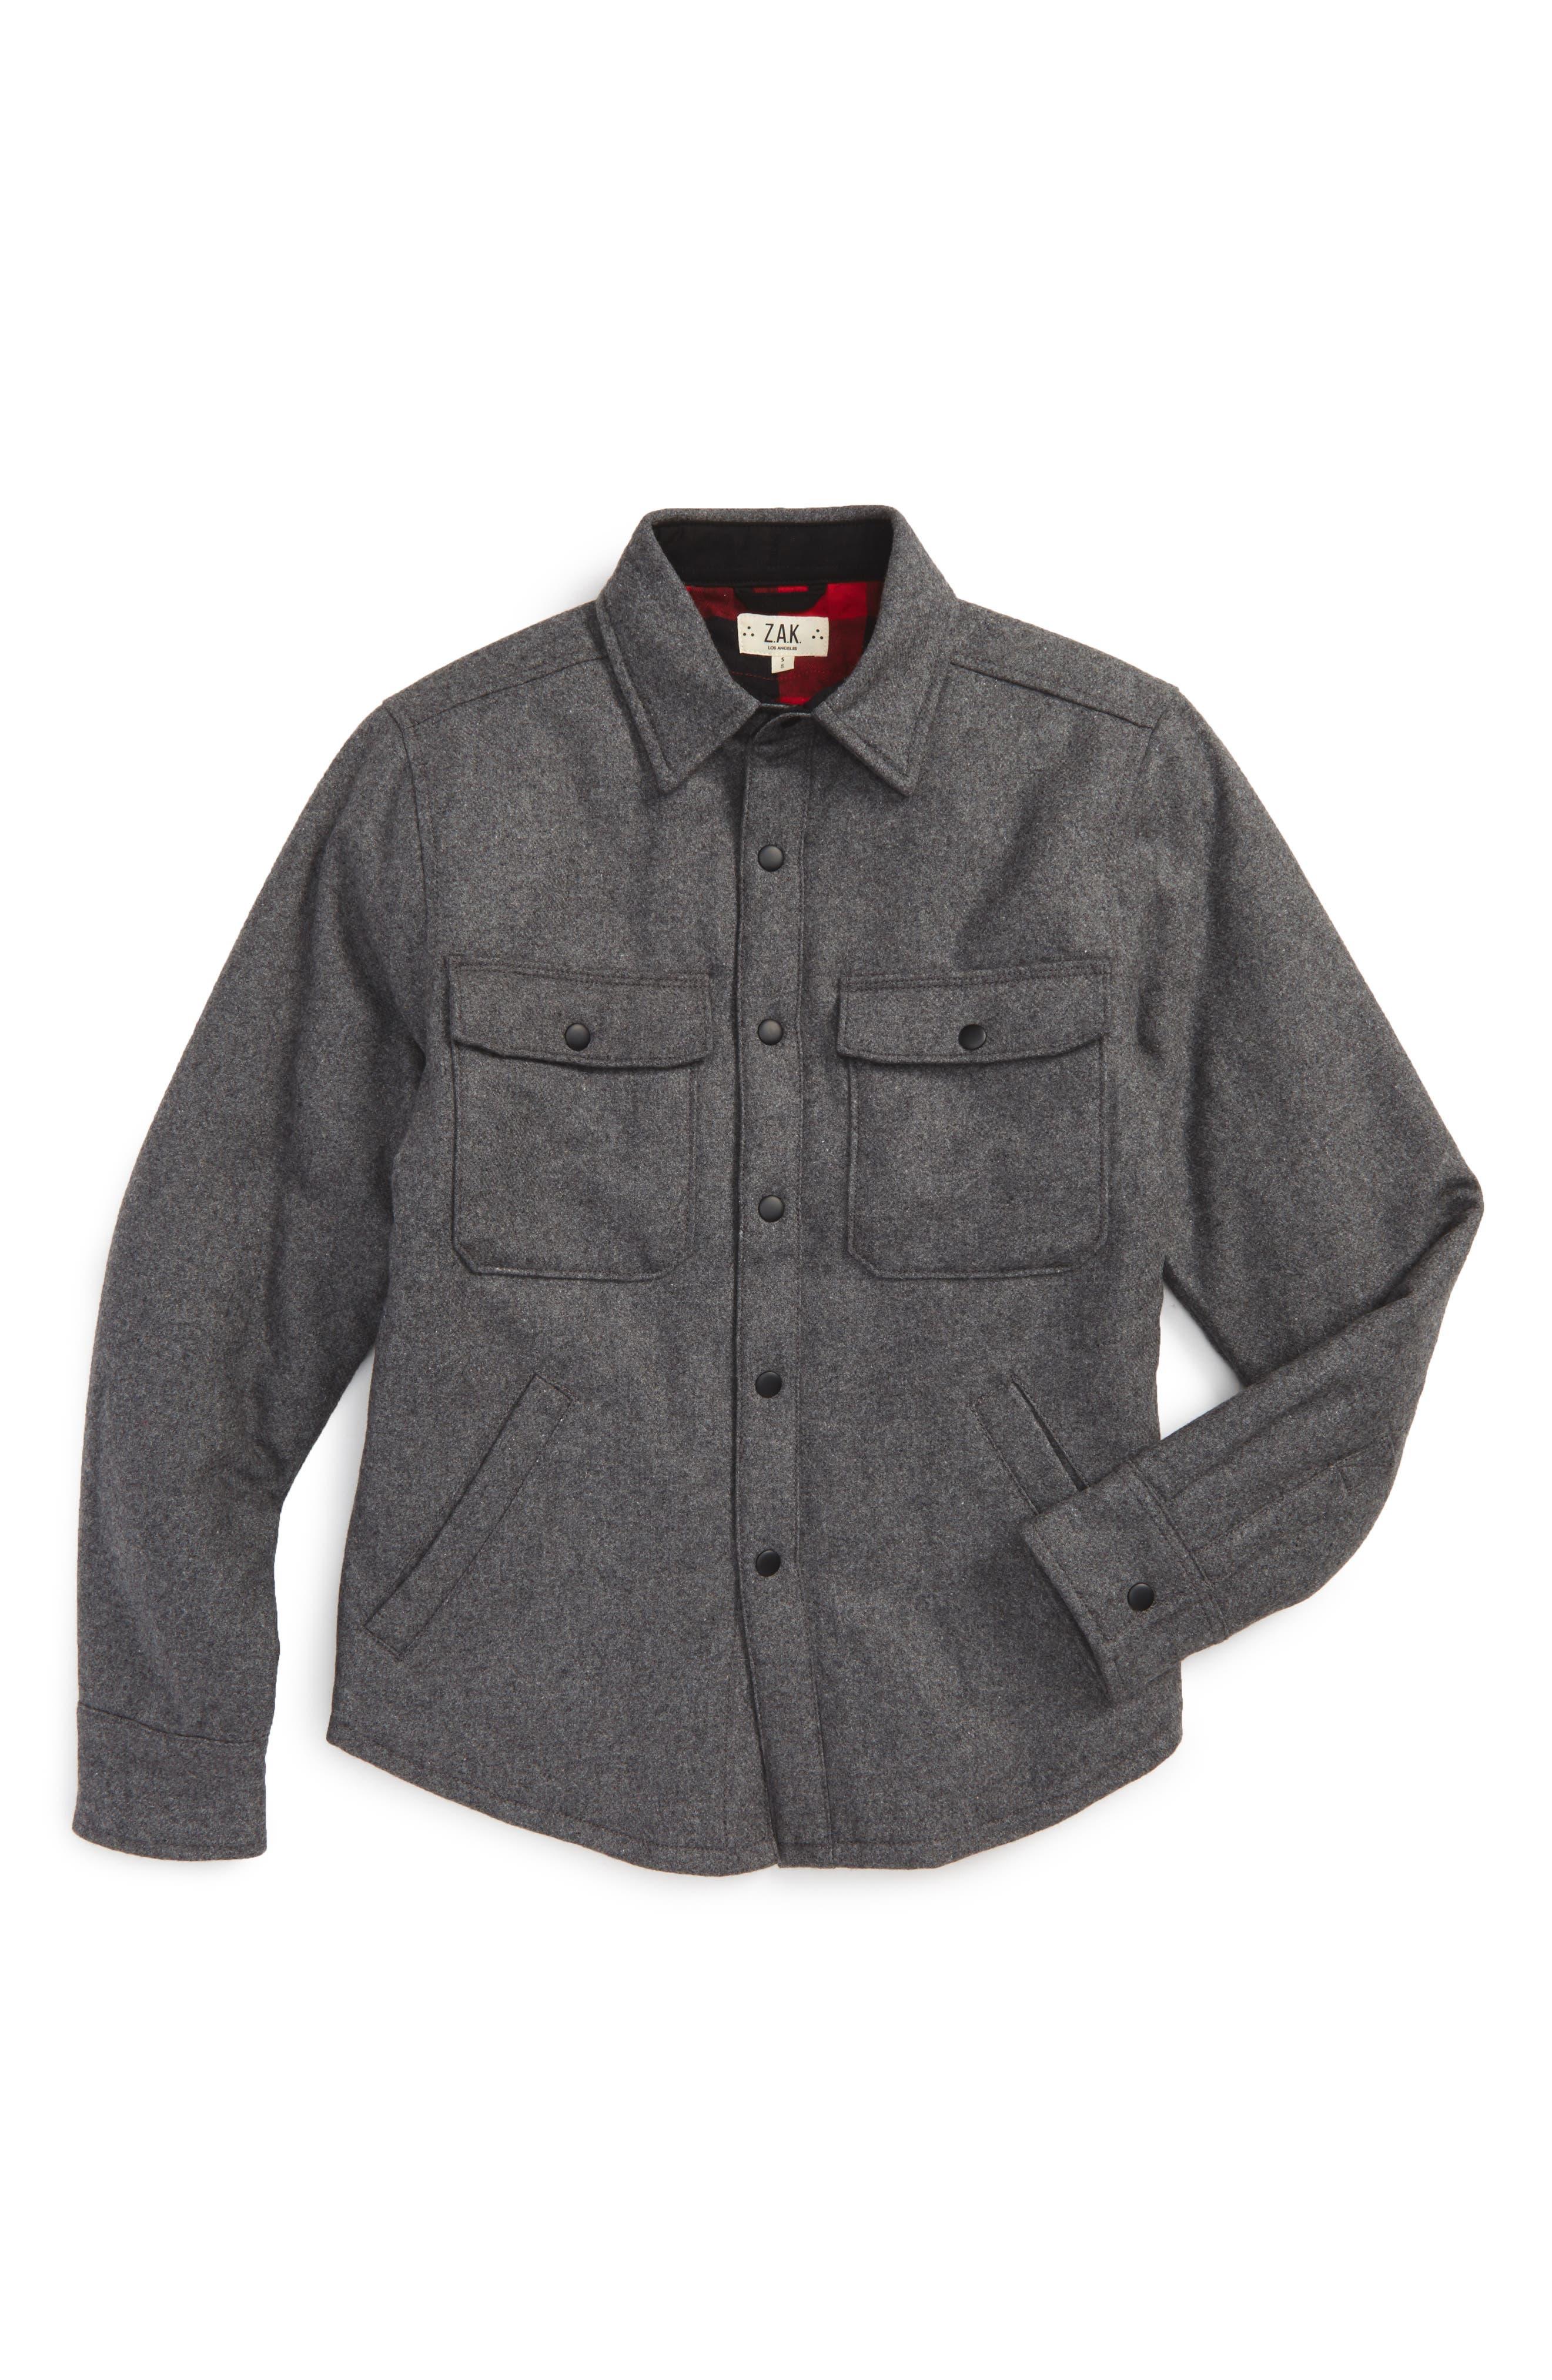 Z.A.K. Brand Flannel Shirt Jacket (Big Boys)